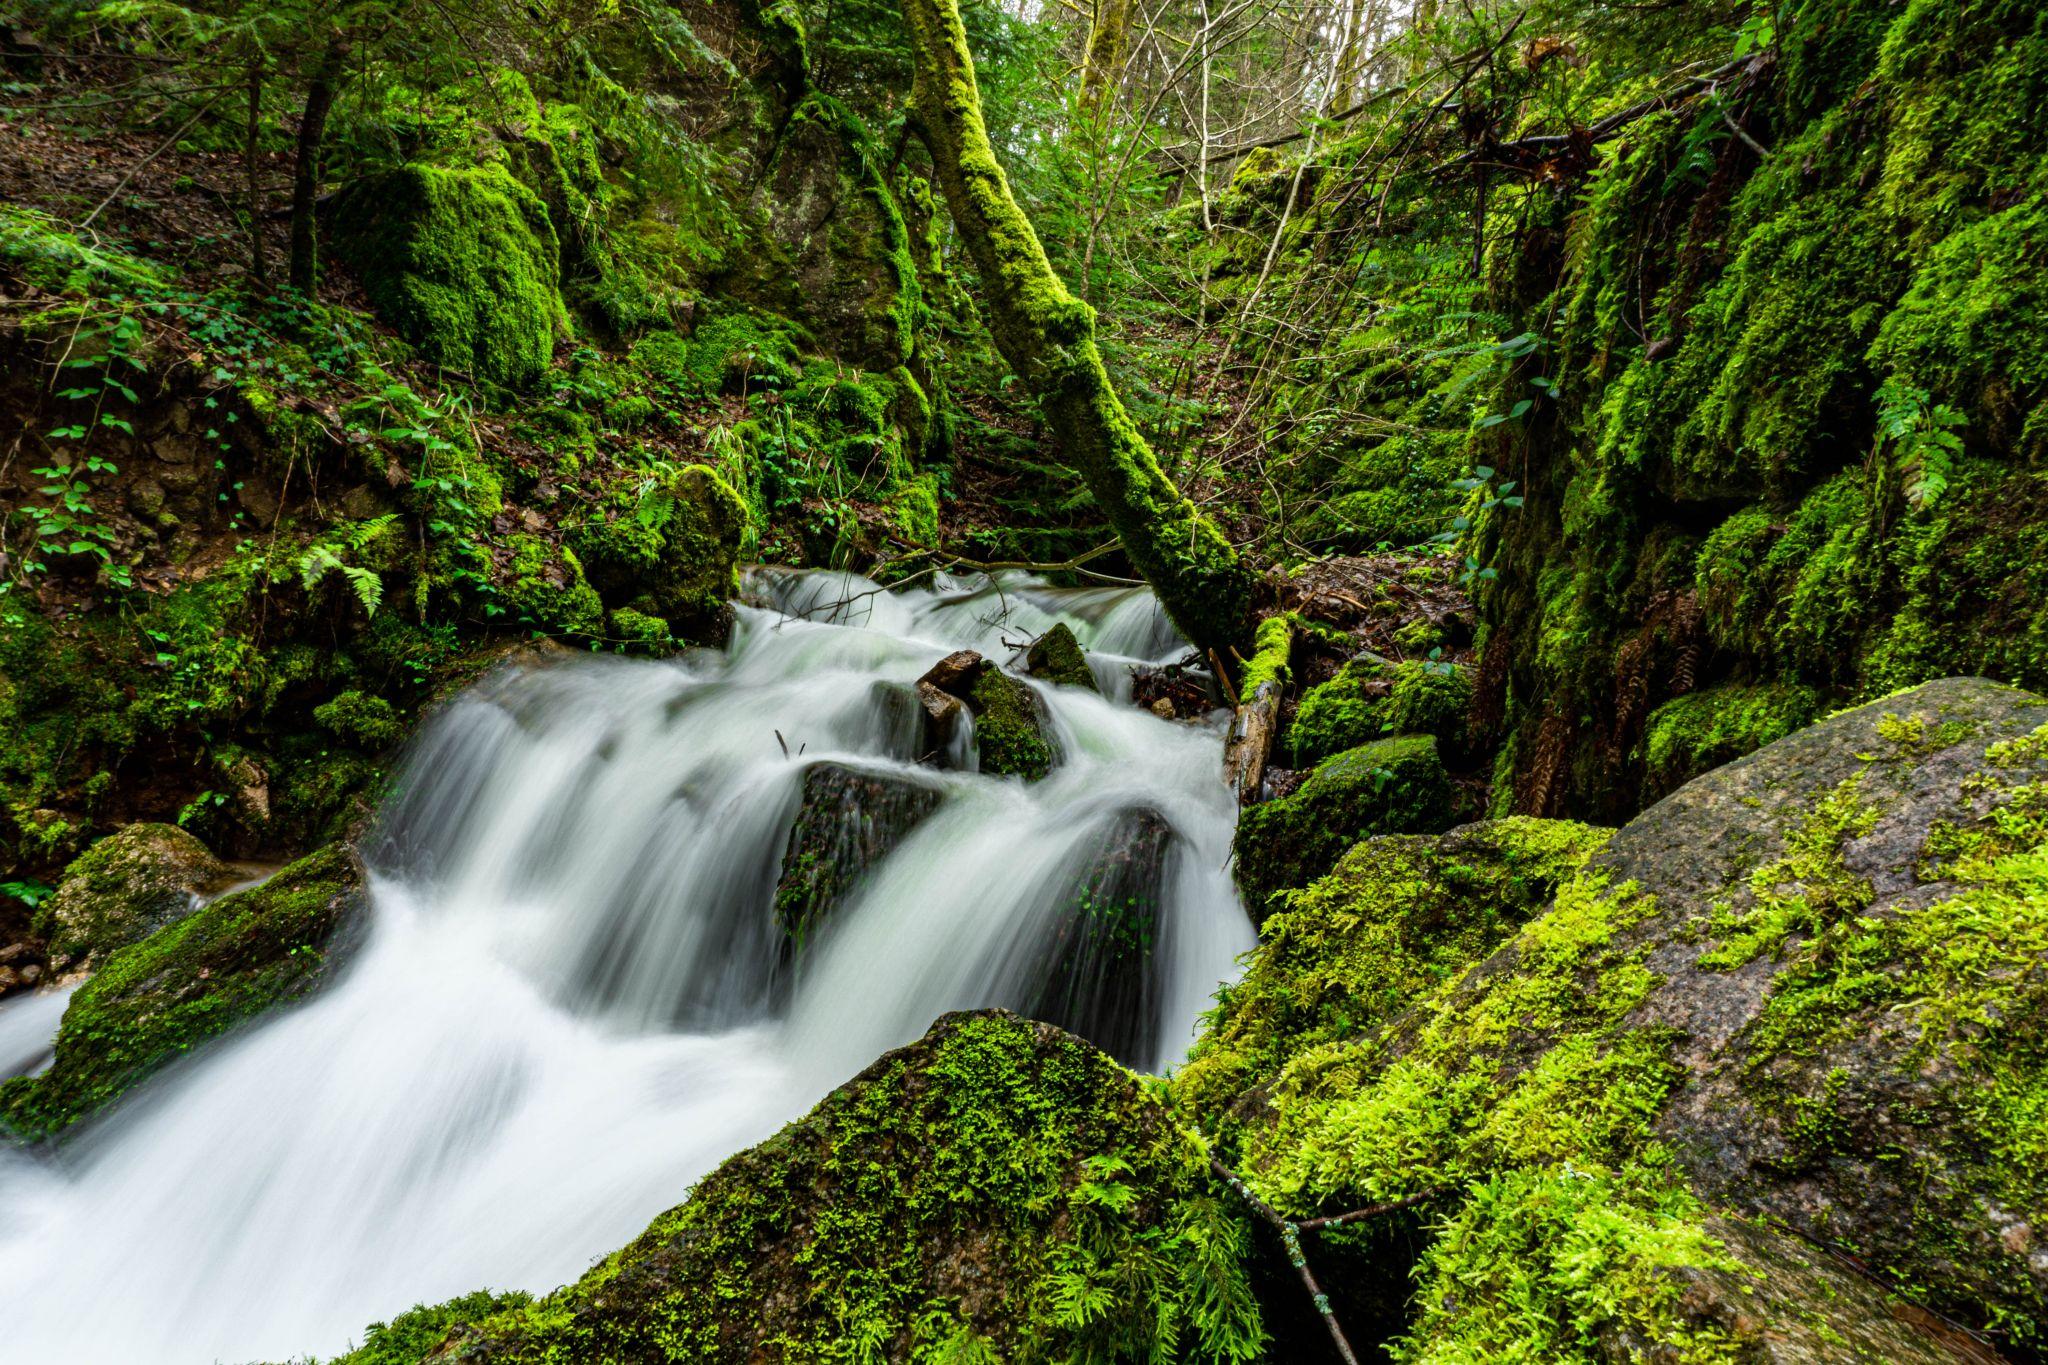 Geroldsauer Wasserfälle Bachlauf, Germany